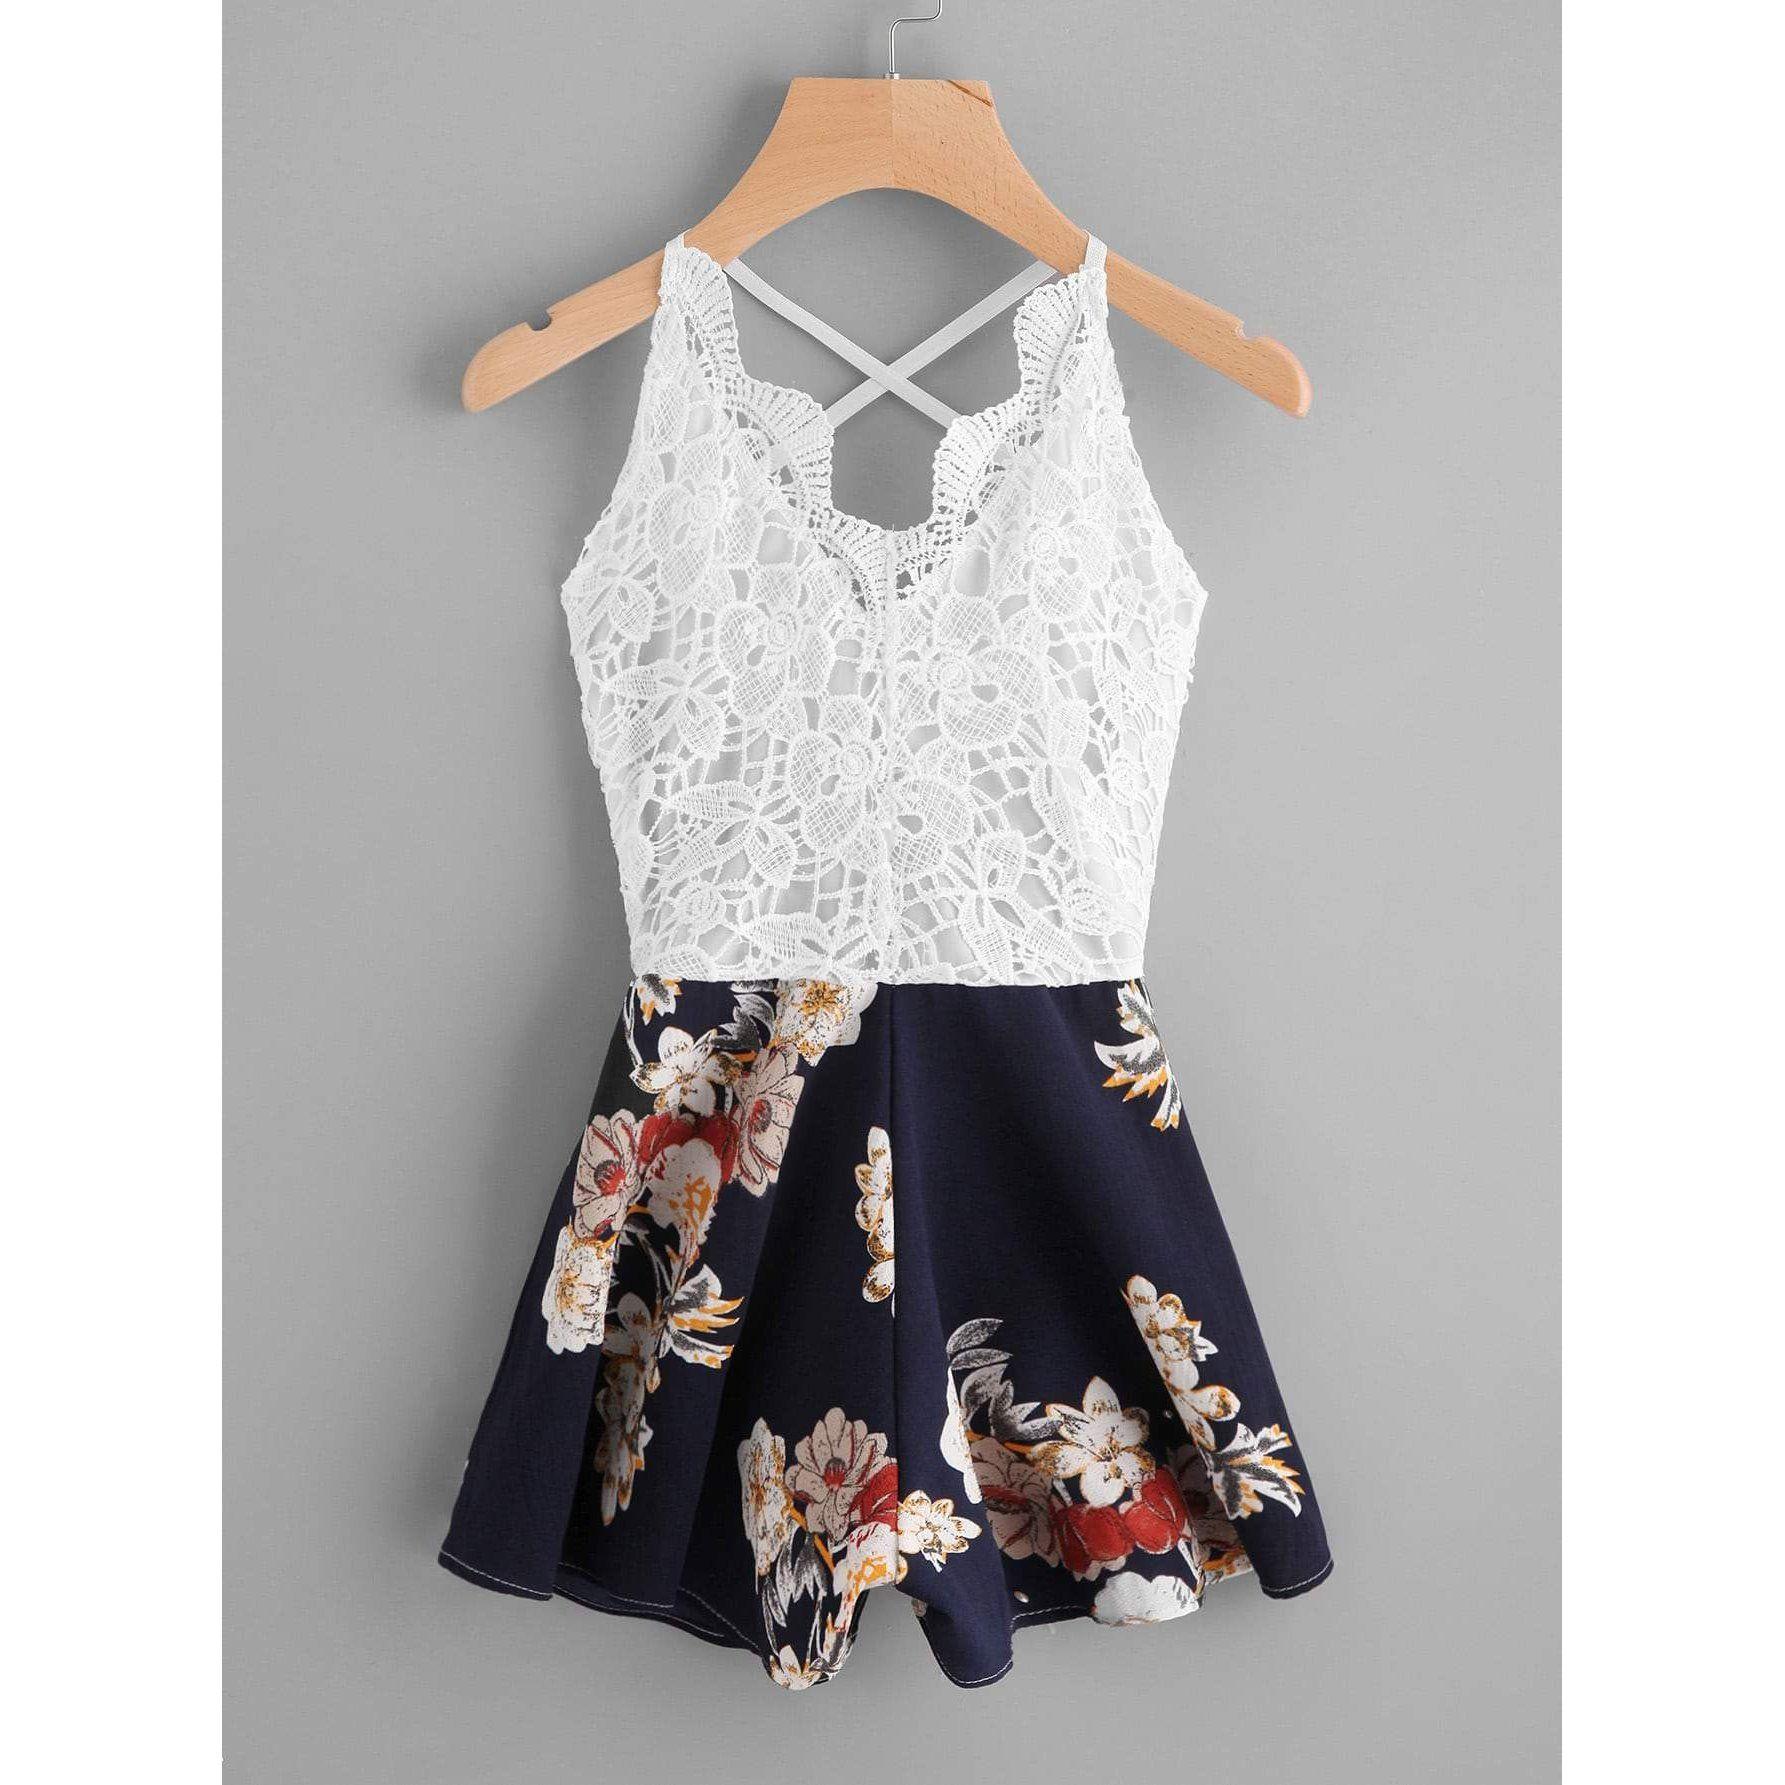 d6130f13319a Crochet Lace Panel Bow Tie Back Florals Romper